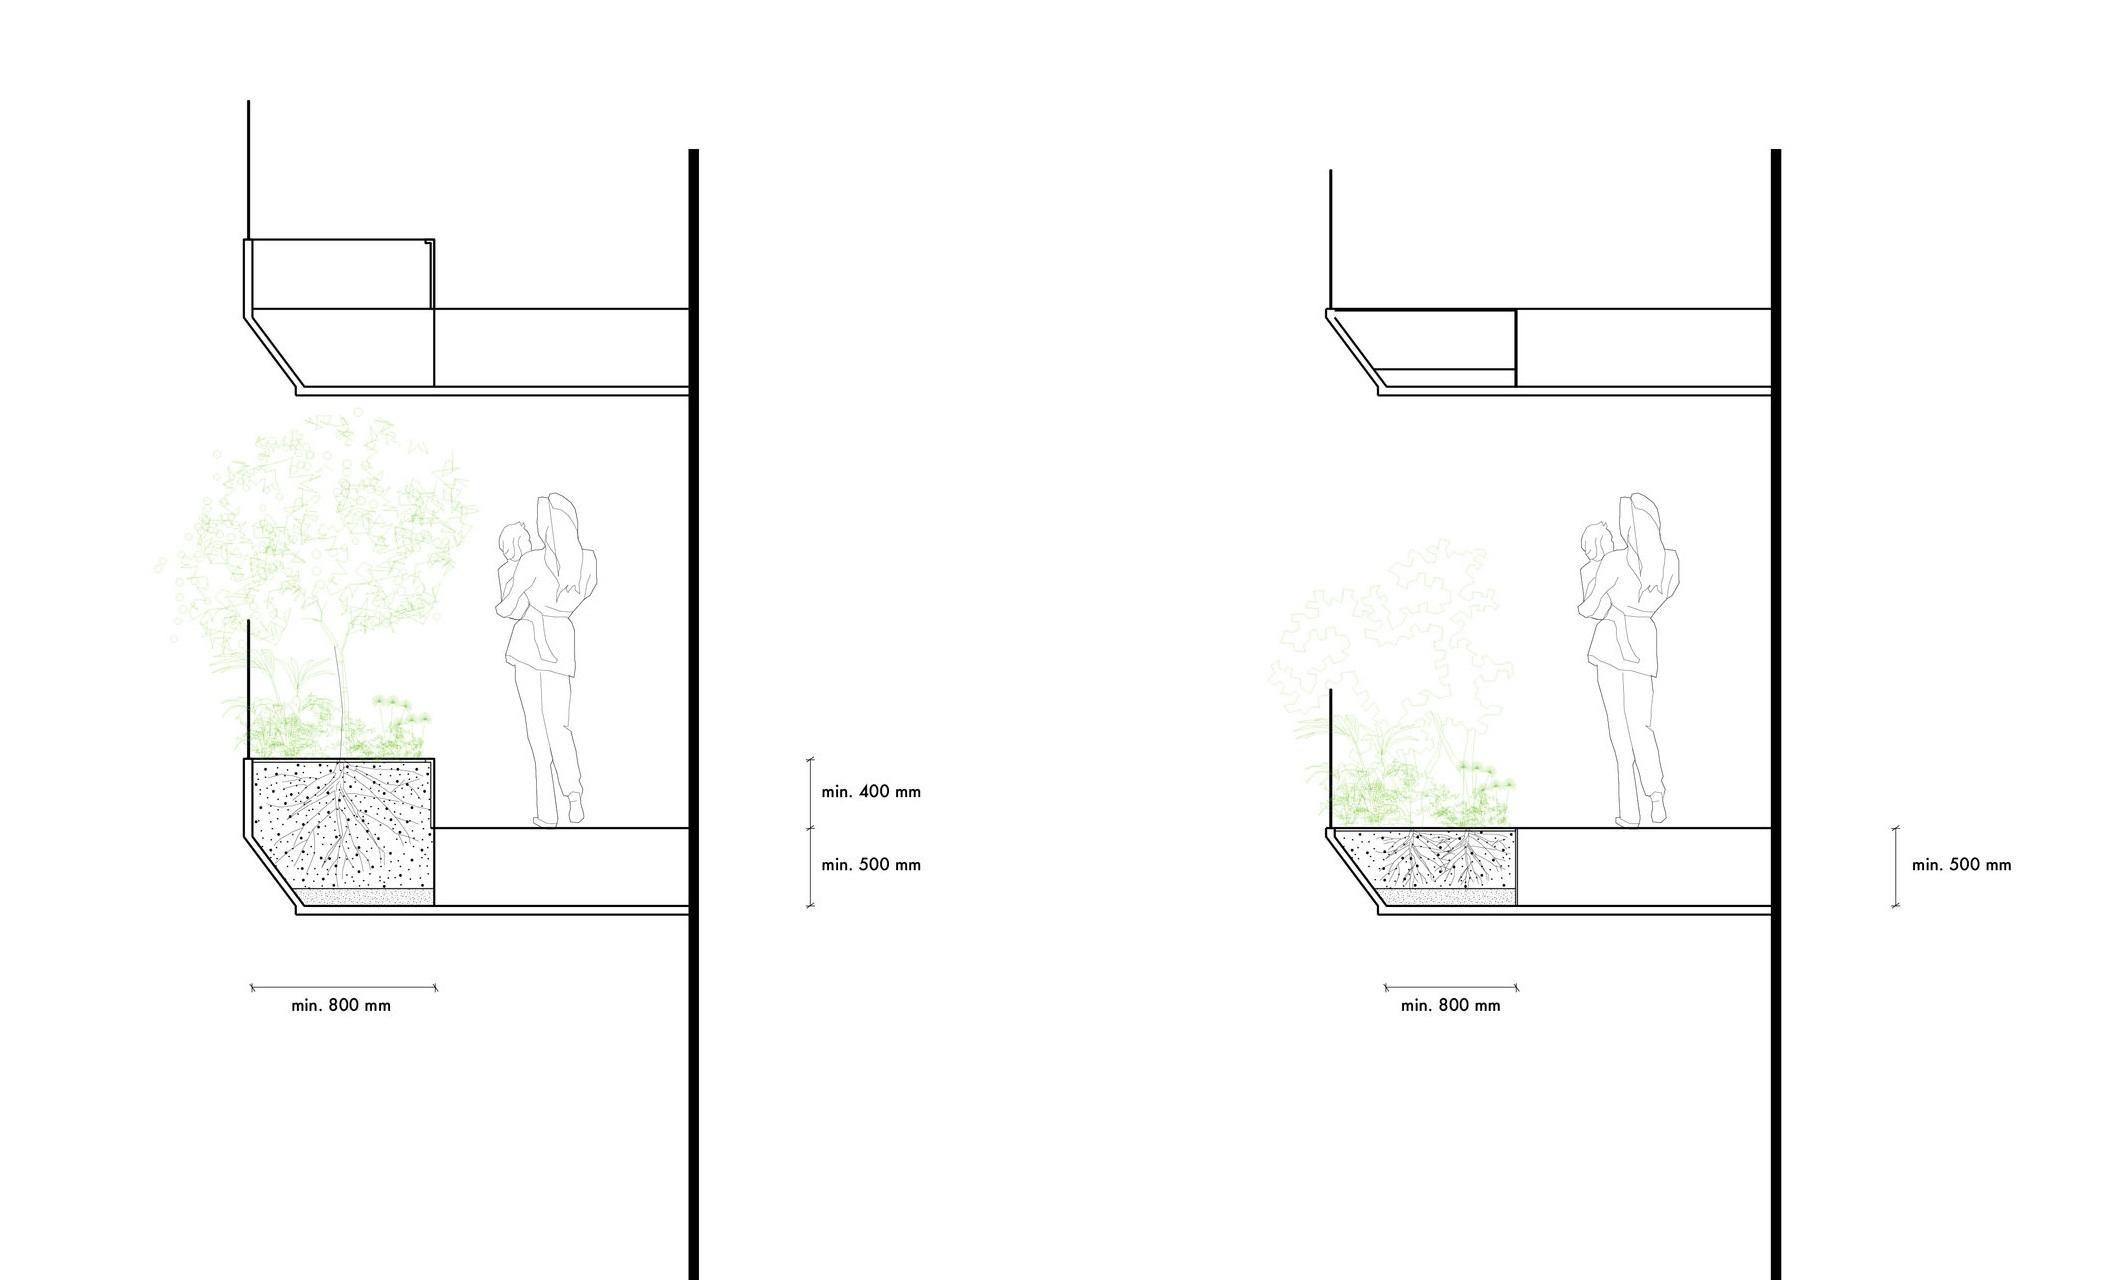 section_balconies_Obszar roboczy 2.jpg